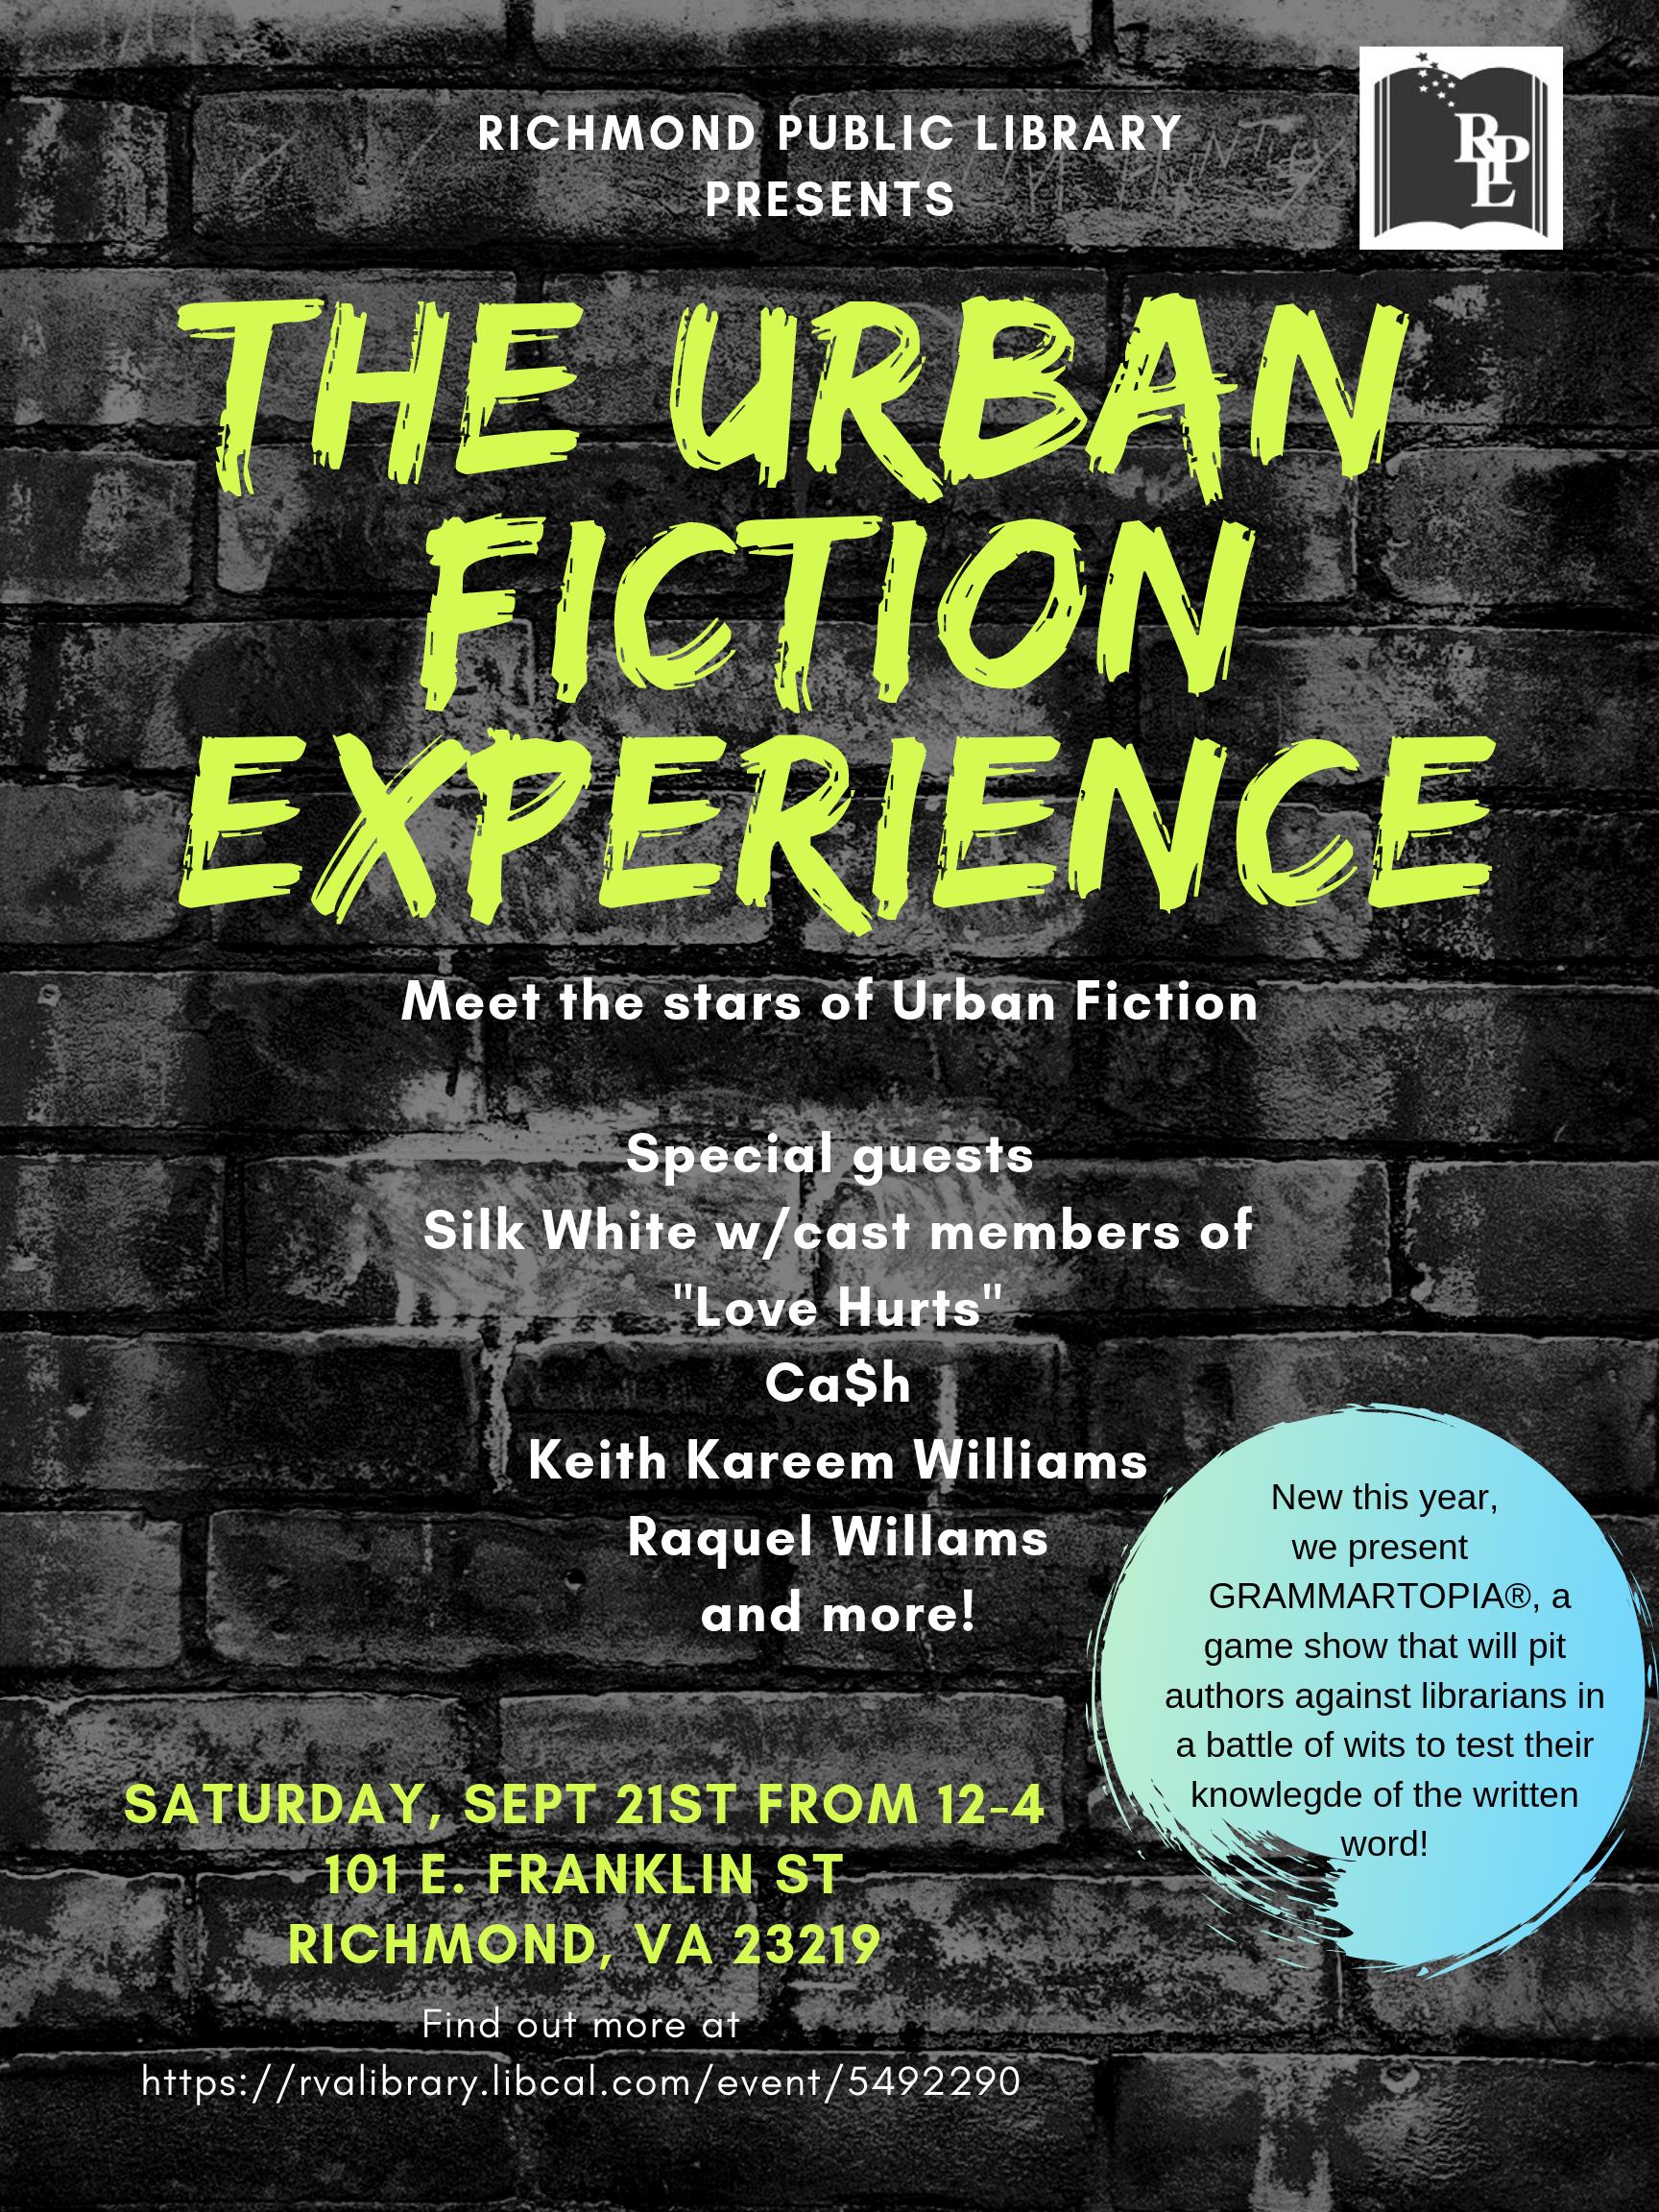 Urban Fiction Experience